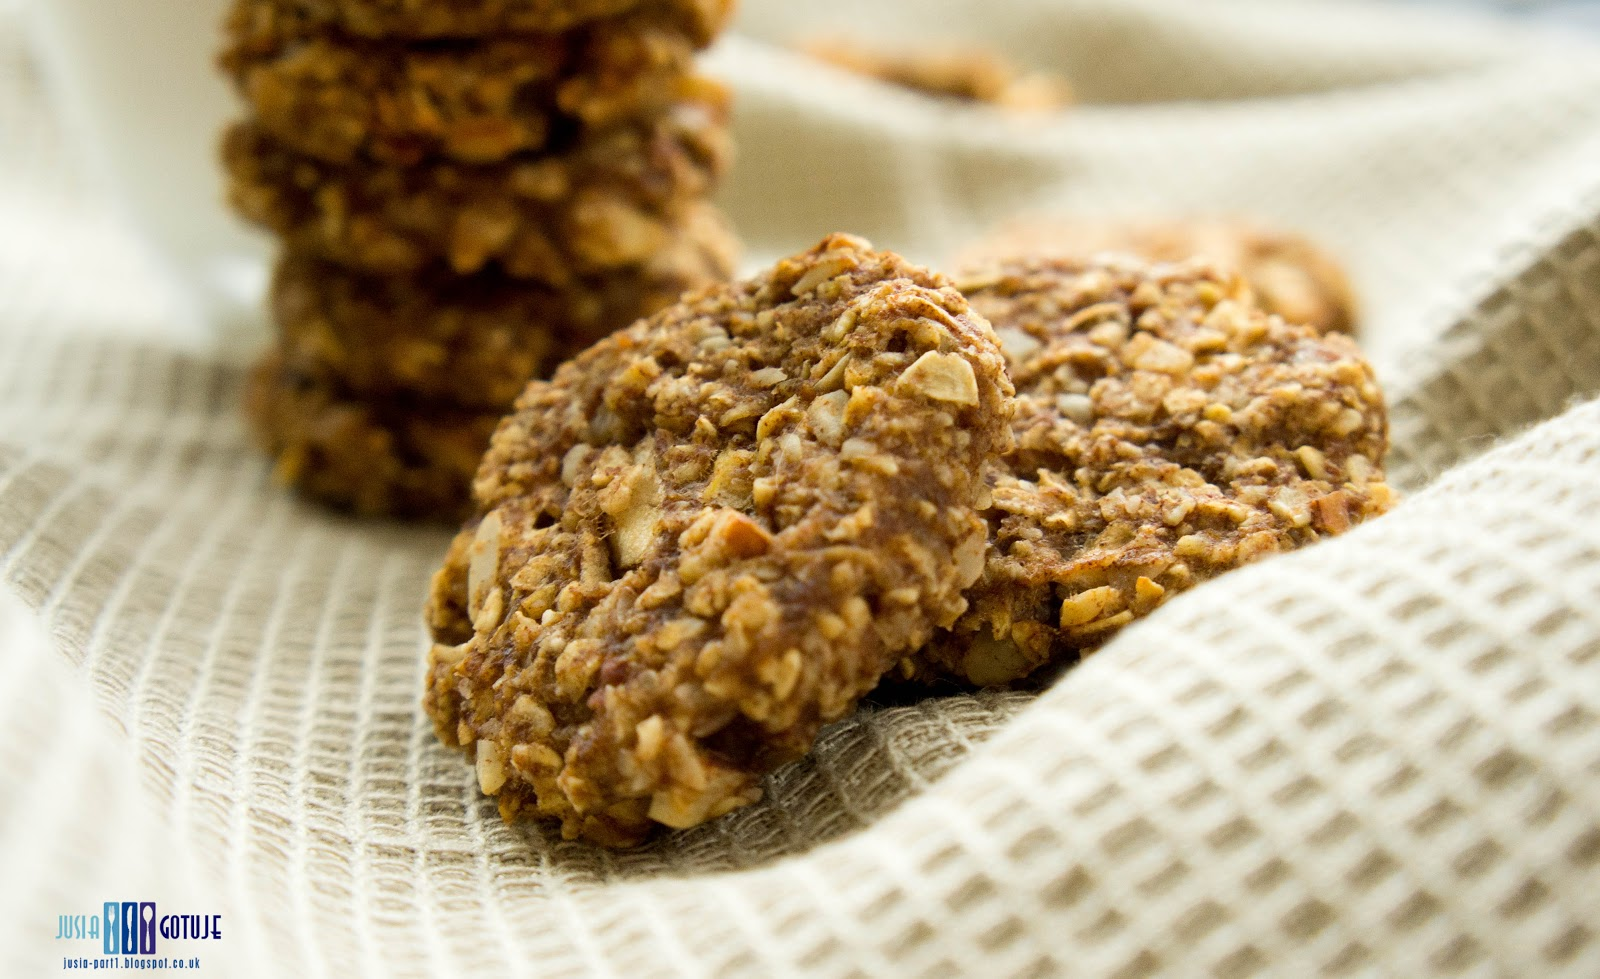 cookies, oats cookies, ciasteczka, ciasteczka owsiane, jablko, apple cookies, cinnamom, jablko i cynamon, healthy, healthy cookies, zdrowe ciasteczka,